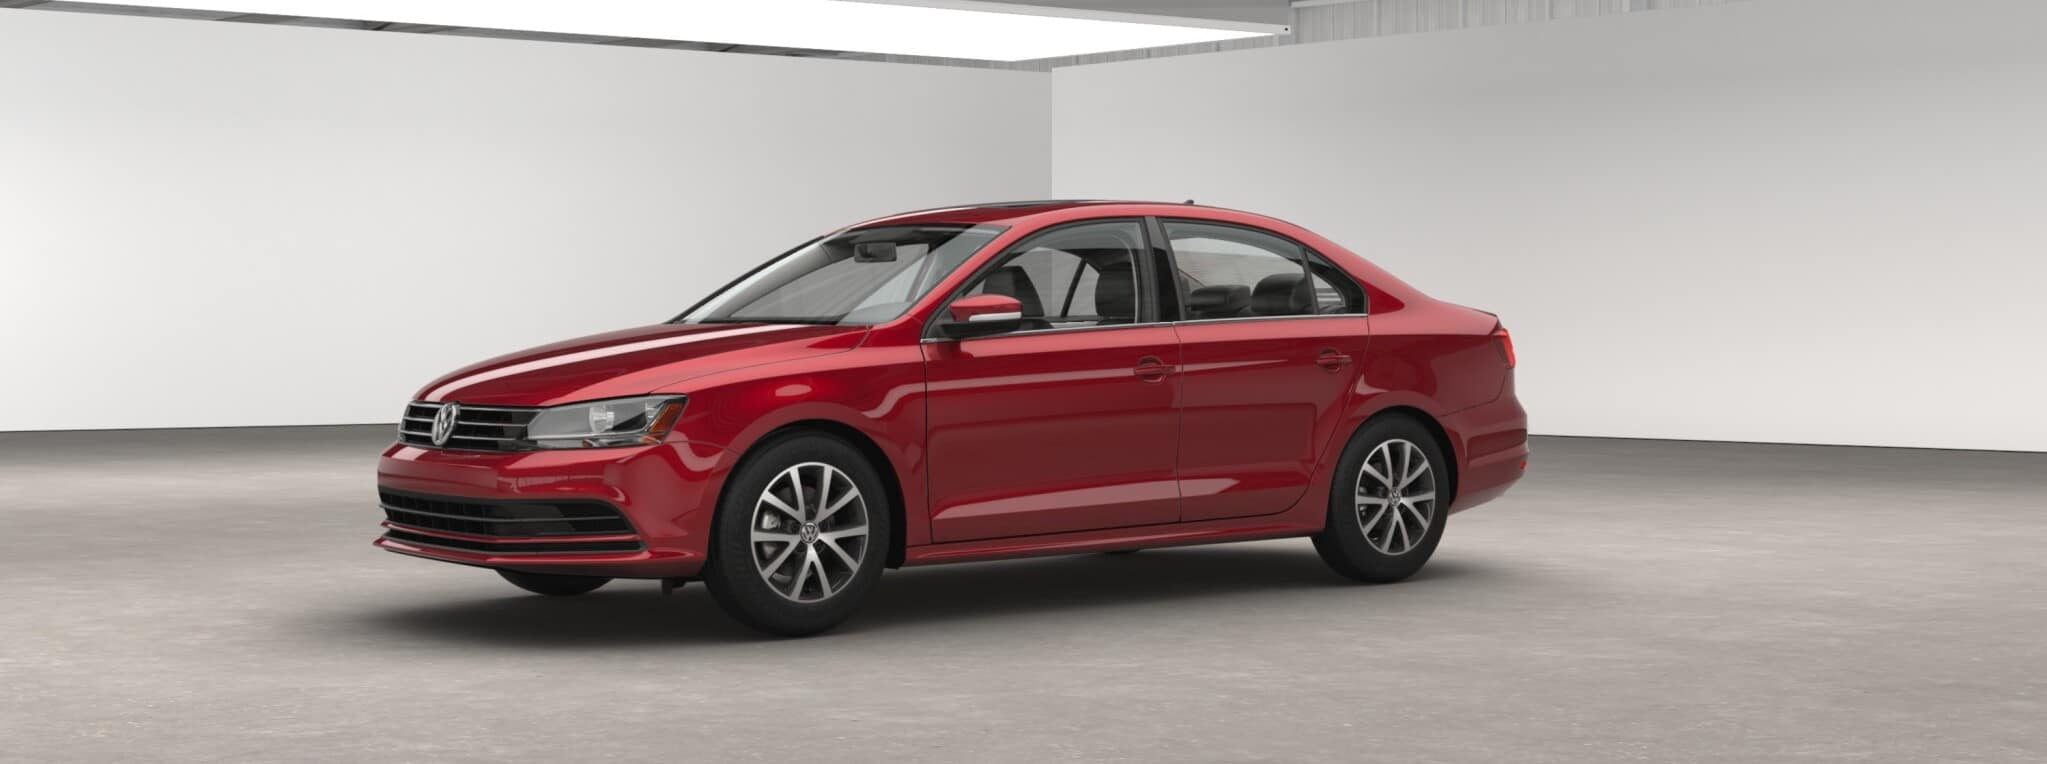 2017 Volkswagen Jetta SE Red Exterior Front View